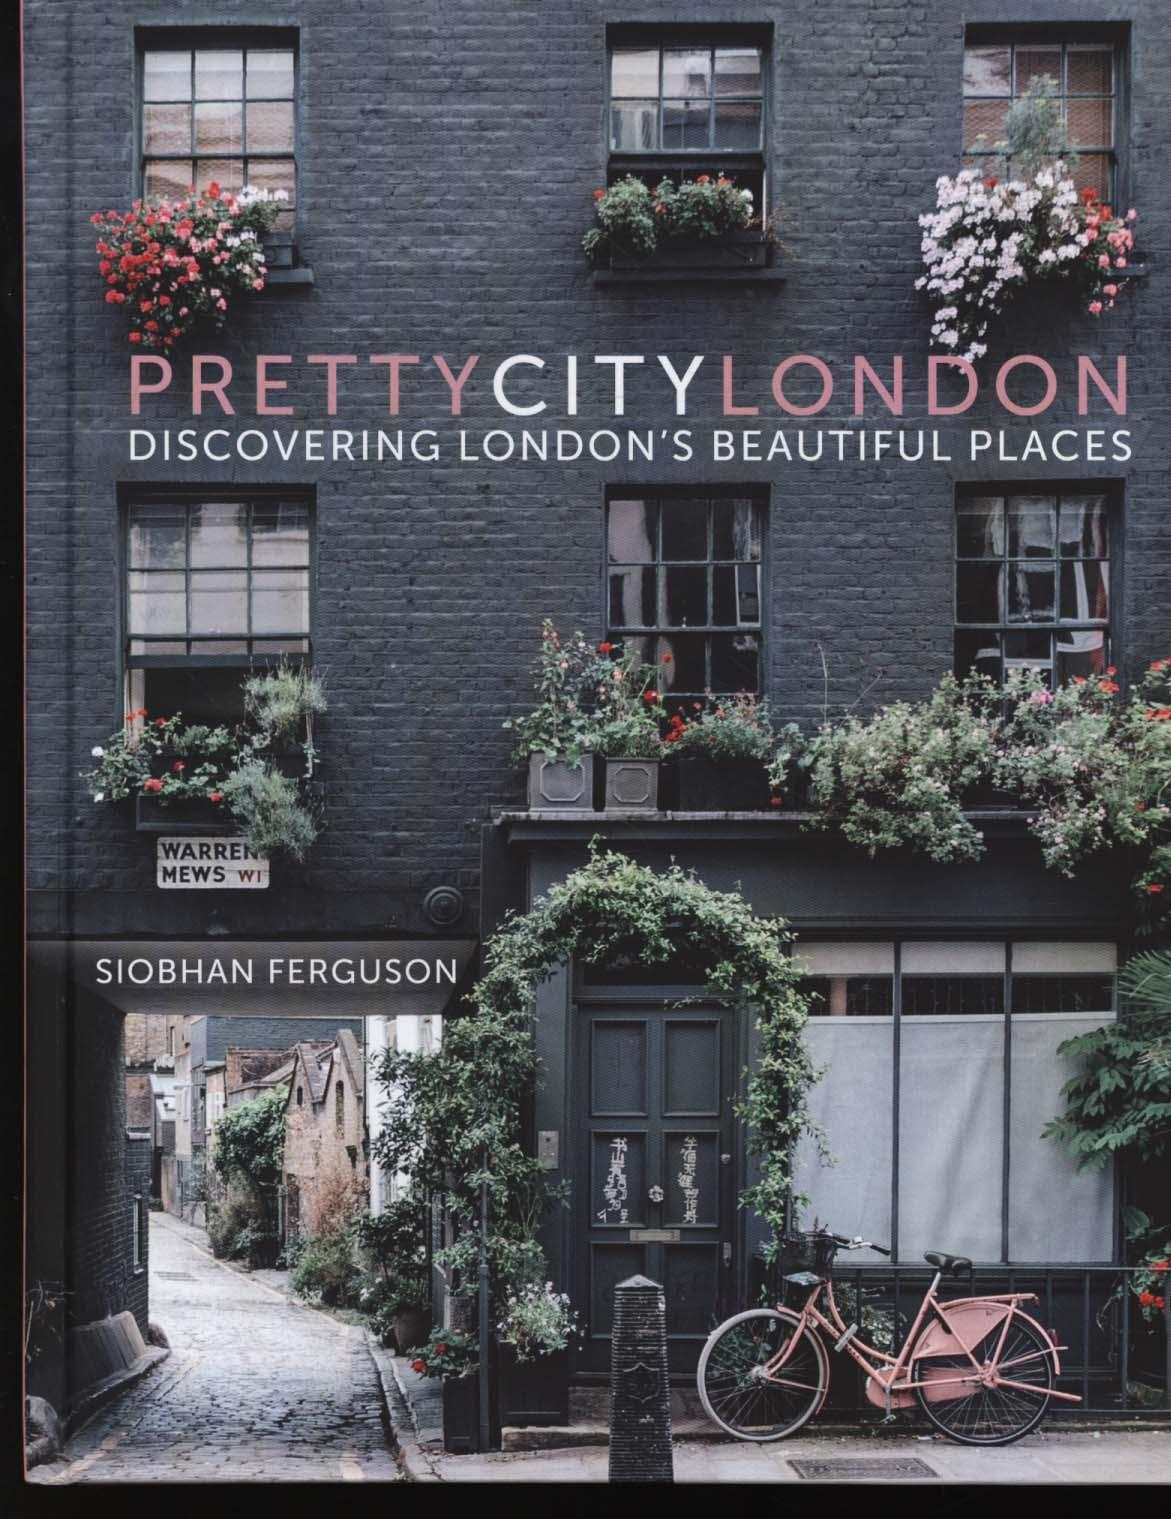 prettycitylondon Discovering London s Beautiful Places